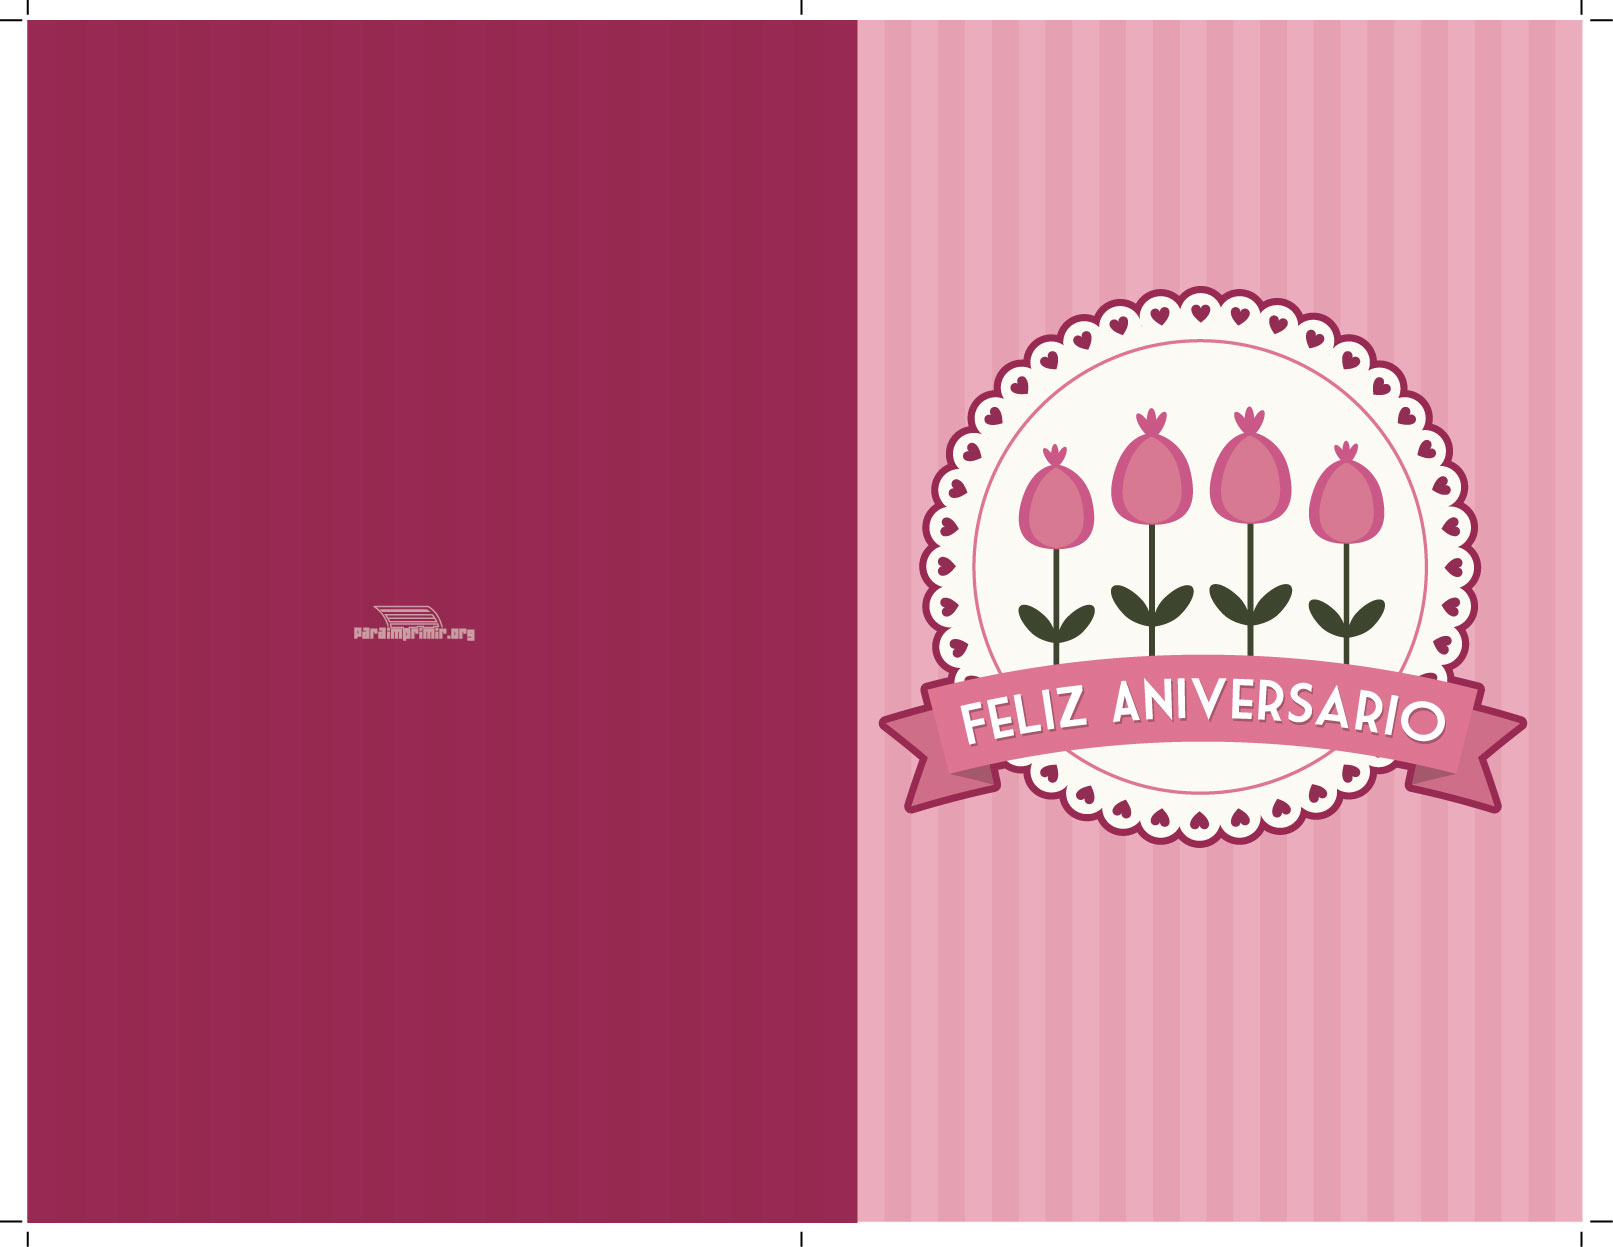 tarjeta de feliz aniversario para imprimir